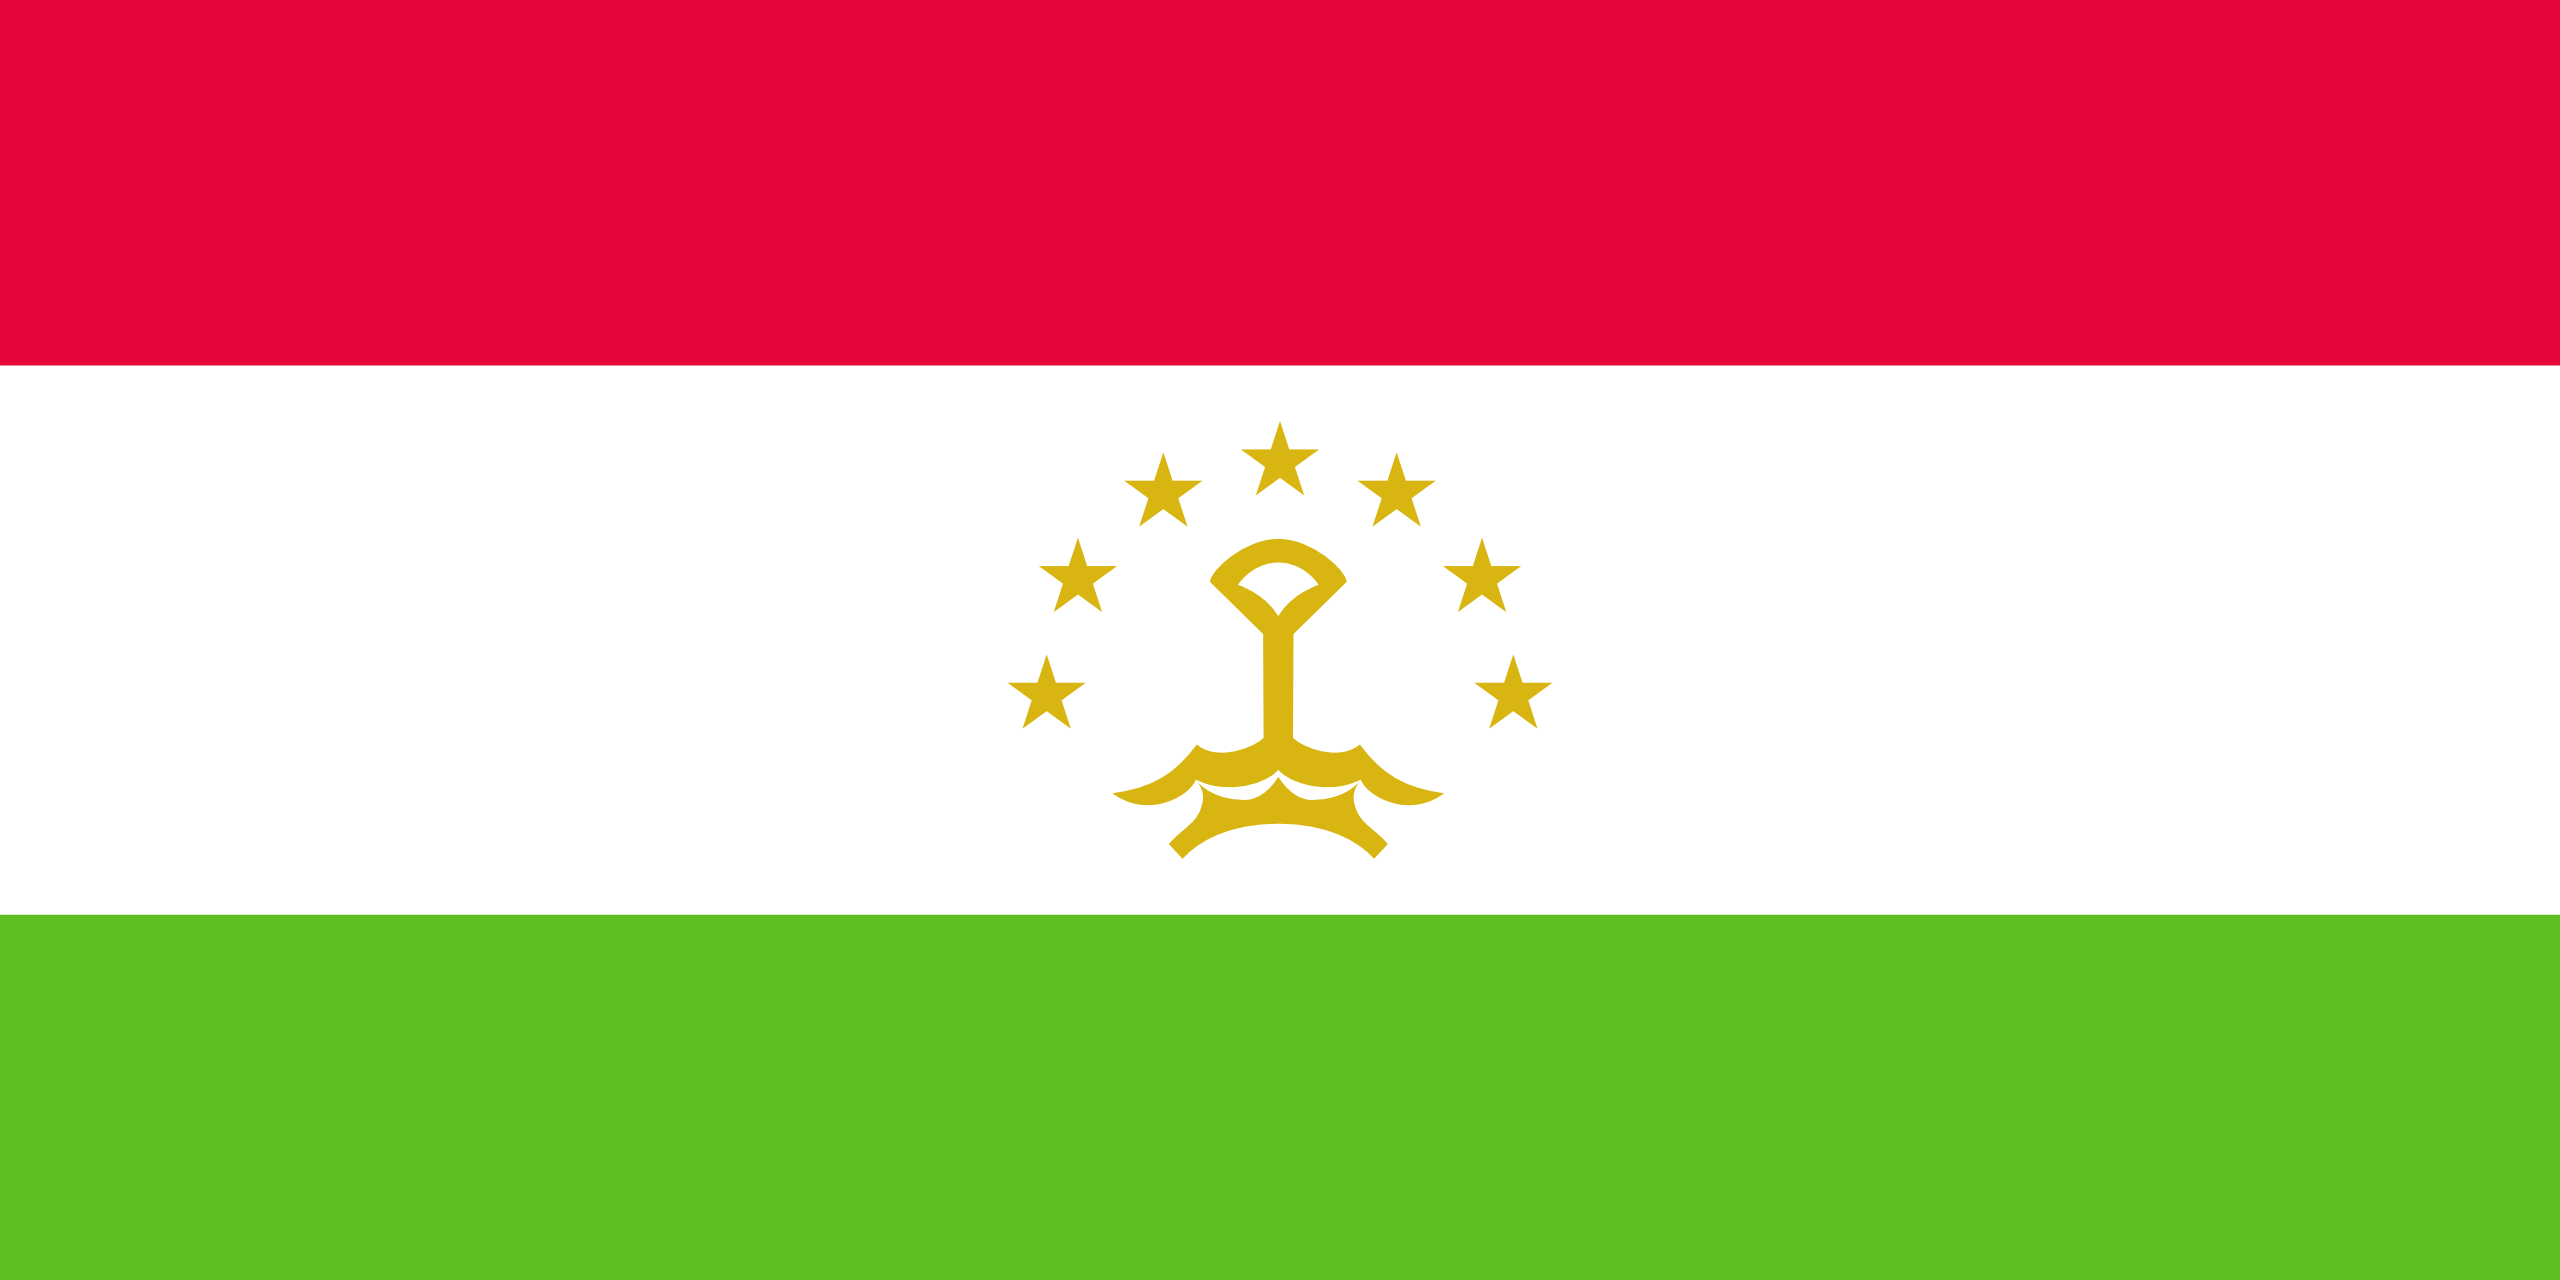 tayikistán, 国家, 会徽, 徽标, 符号 - 高清壁纸 - 教授-falken.com